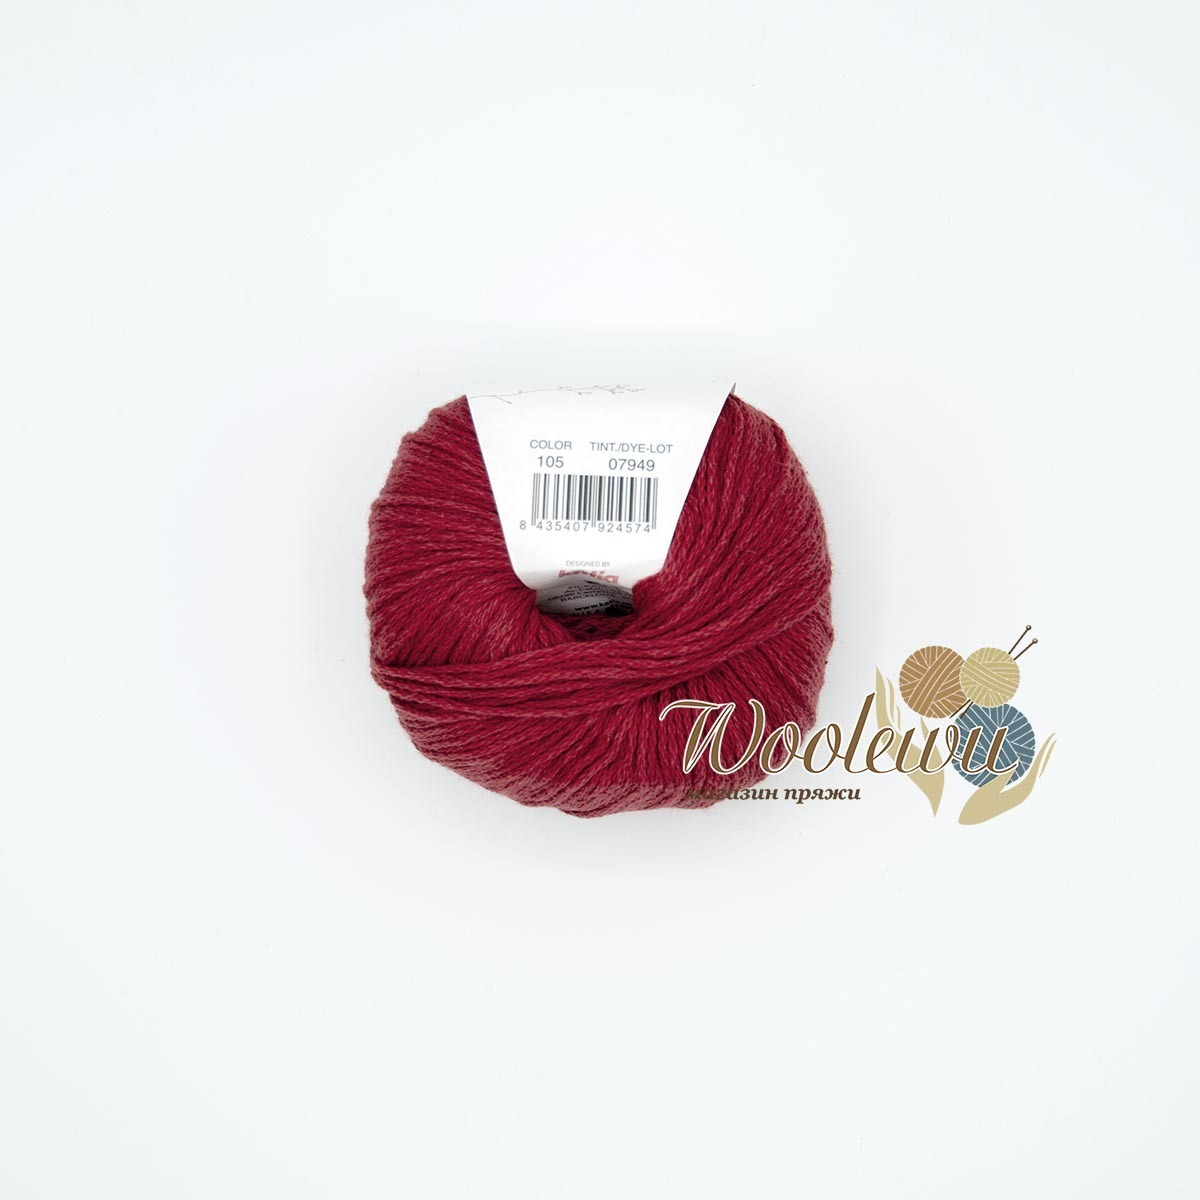 Katia Concept Cotton Yak - 105